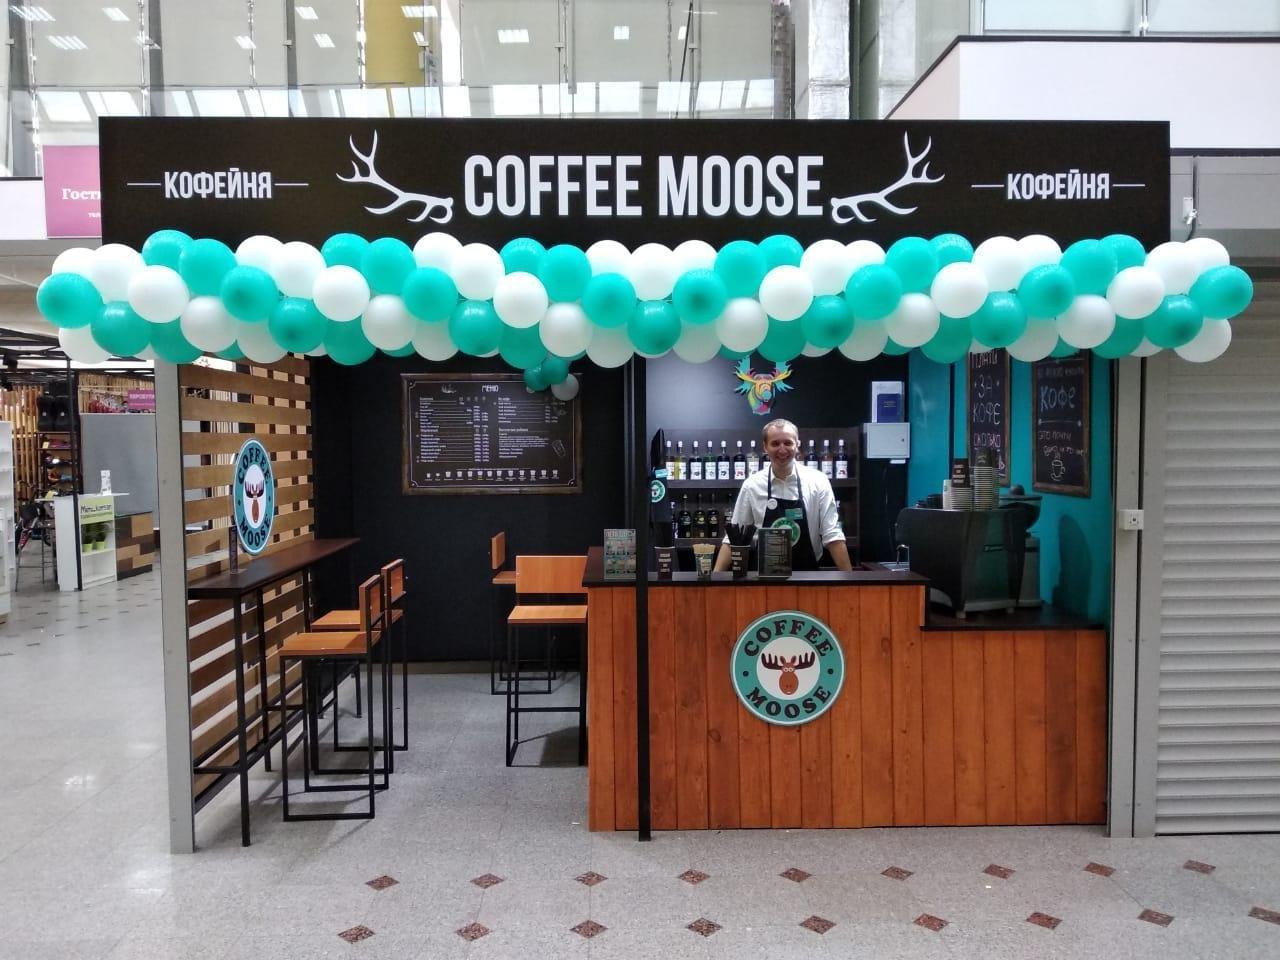 Франшиза кофейни Coffee Moose